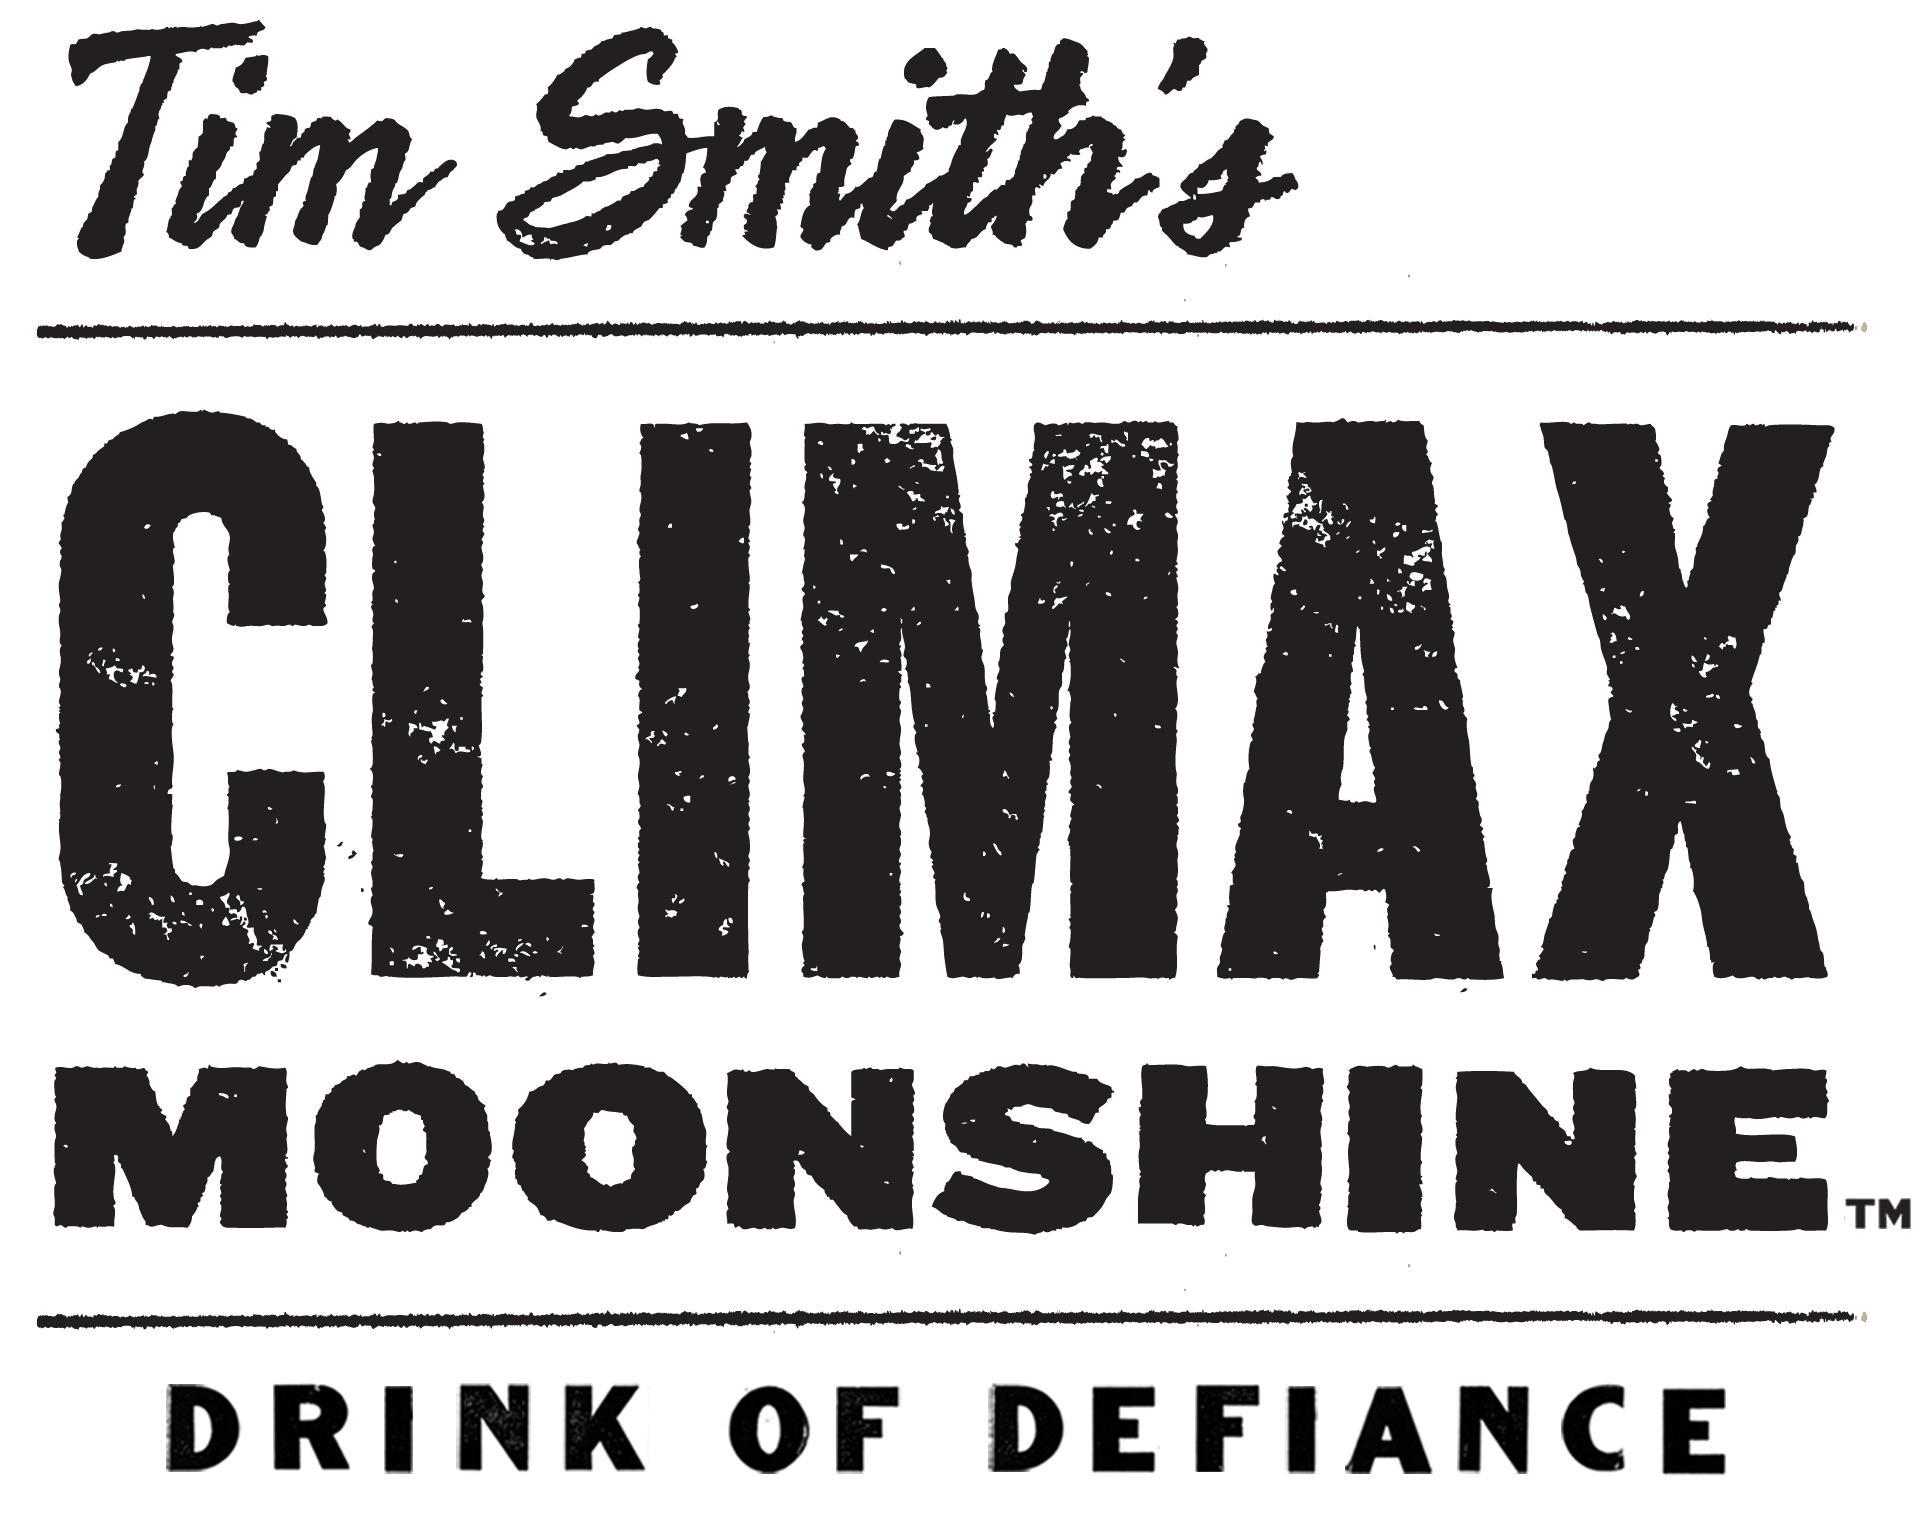 Moonshiners Logo Moonshine Brand Logo